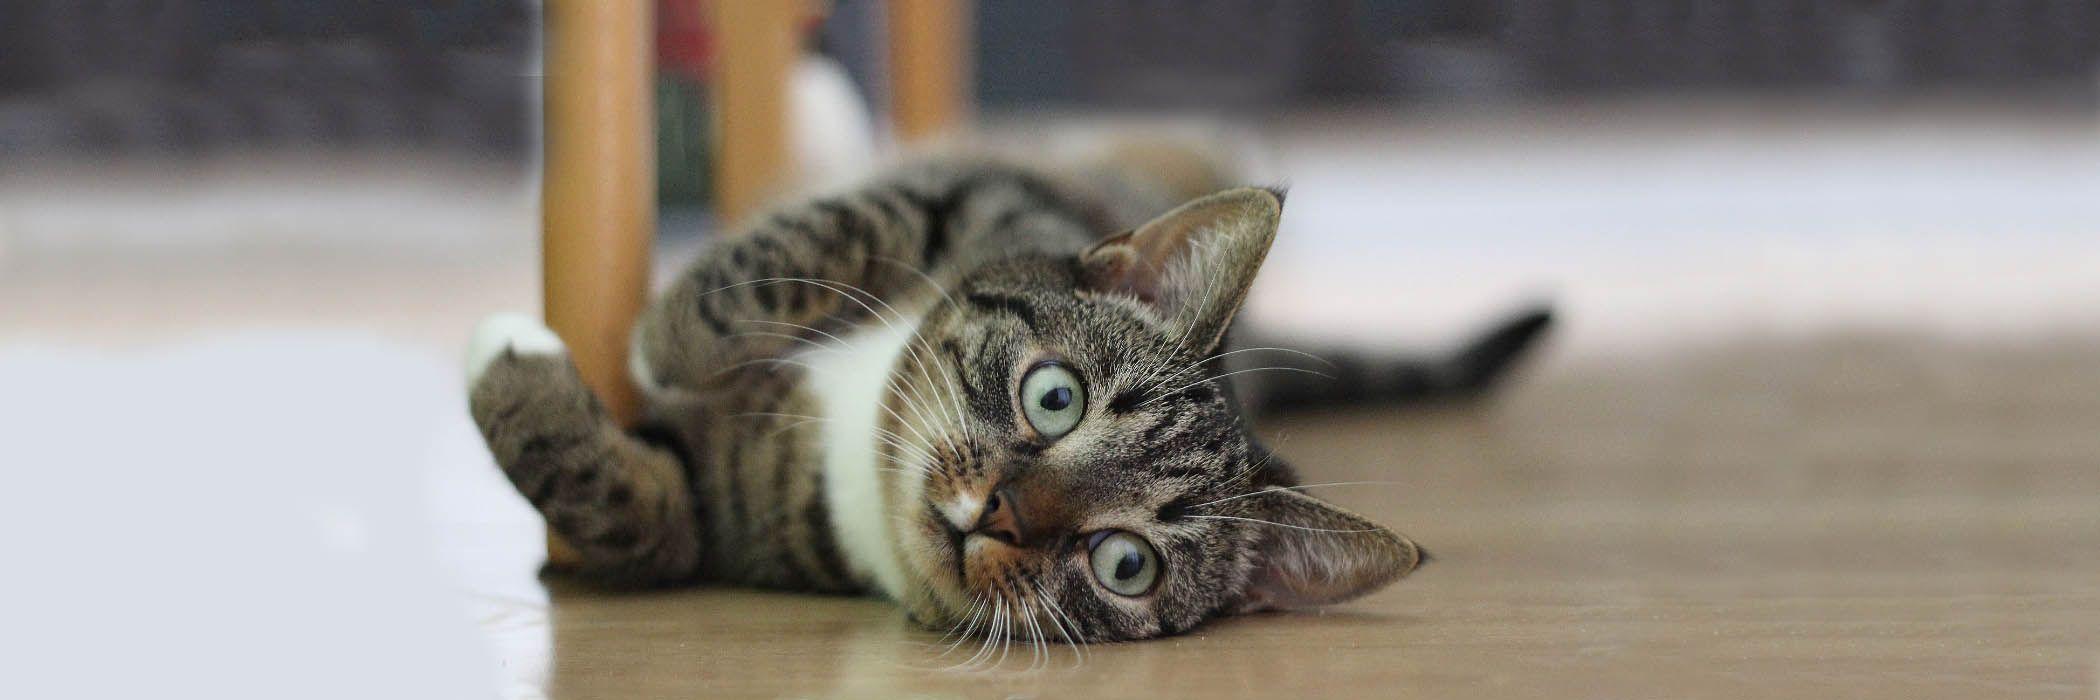 Why Adopt Kitten Rescue Kitten Adoption Cat Adoption